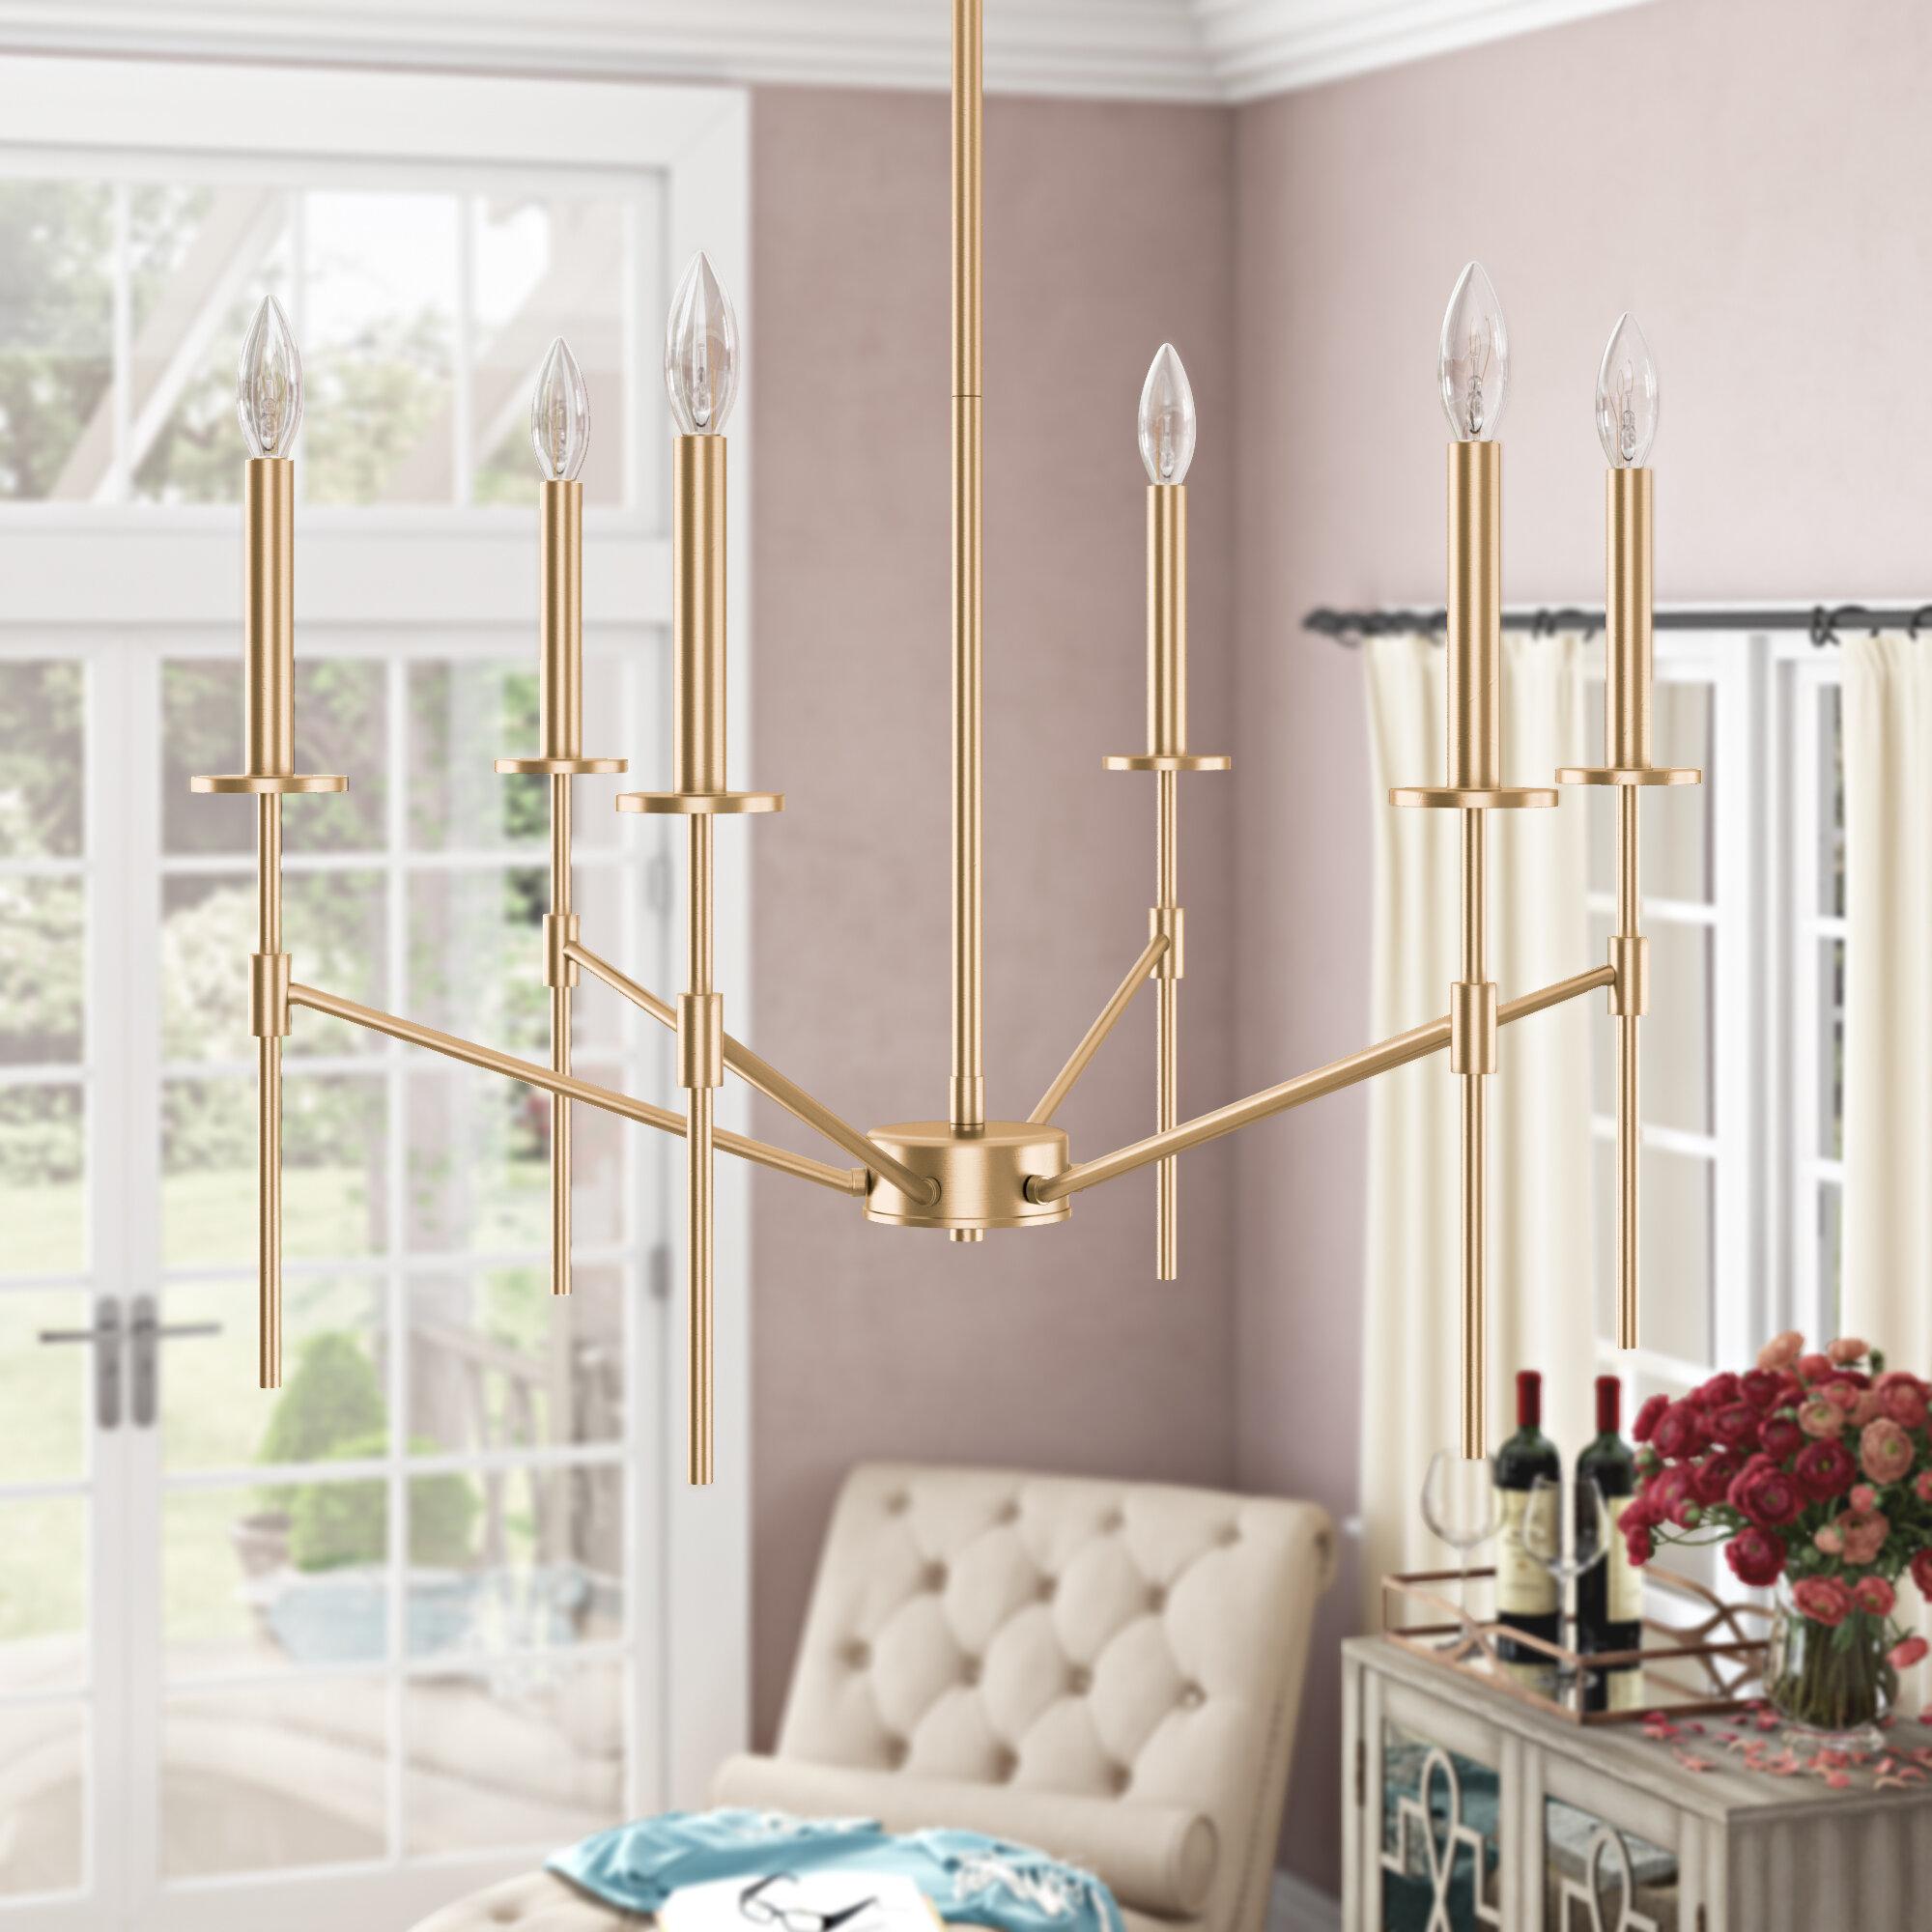 Willa Arlo Interiors Diamanta 6 Light Candle Style Classic Traditional Chandelier Reviews Wayfair